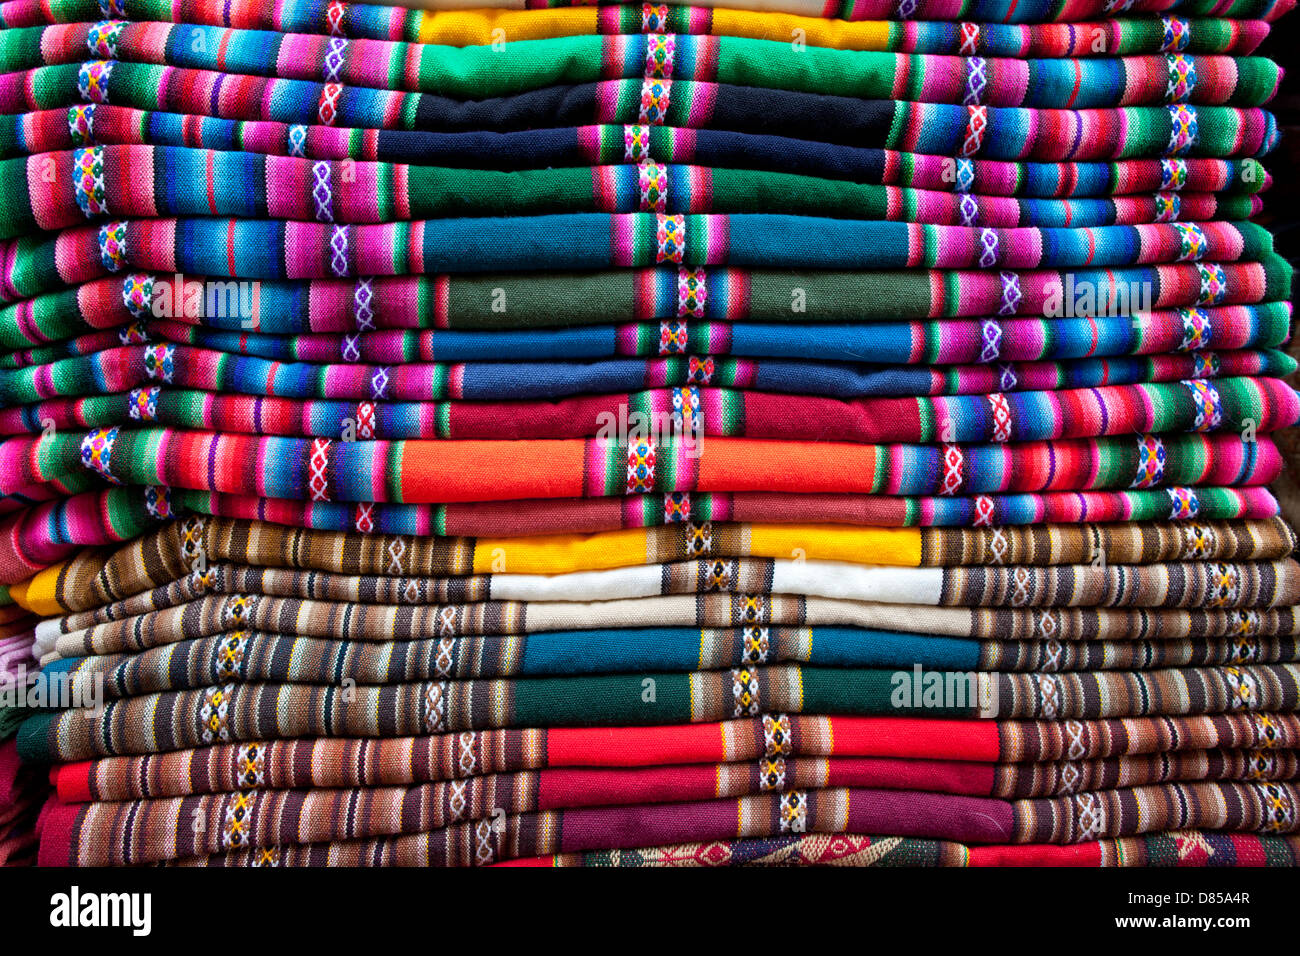 Textiles on sale in a market in Bolivia close to La Paz - Stock Image